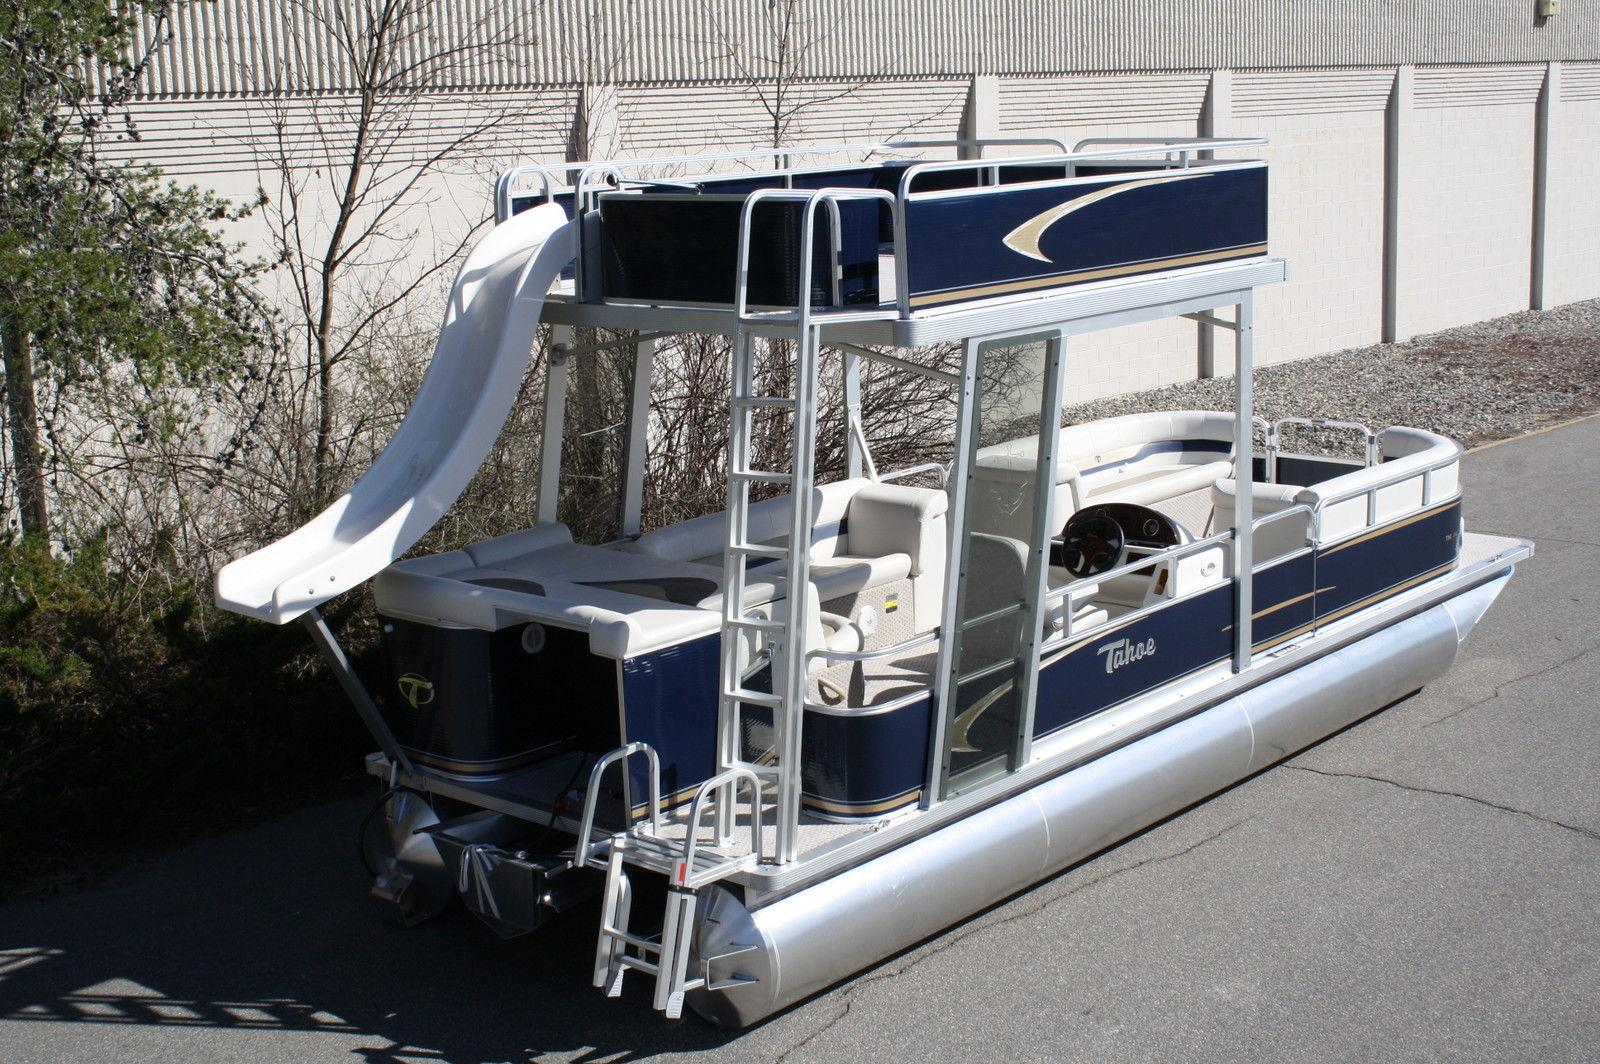 For sale: 2014 Tahoe Grand Island 24 Pontoon boat with slide